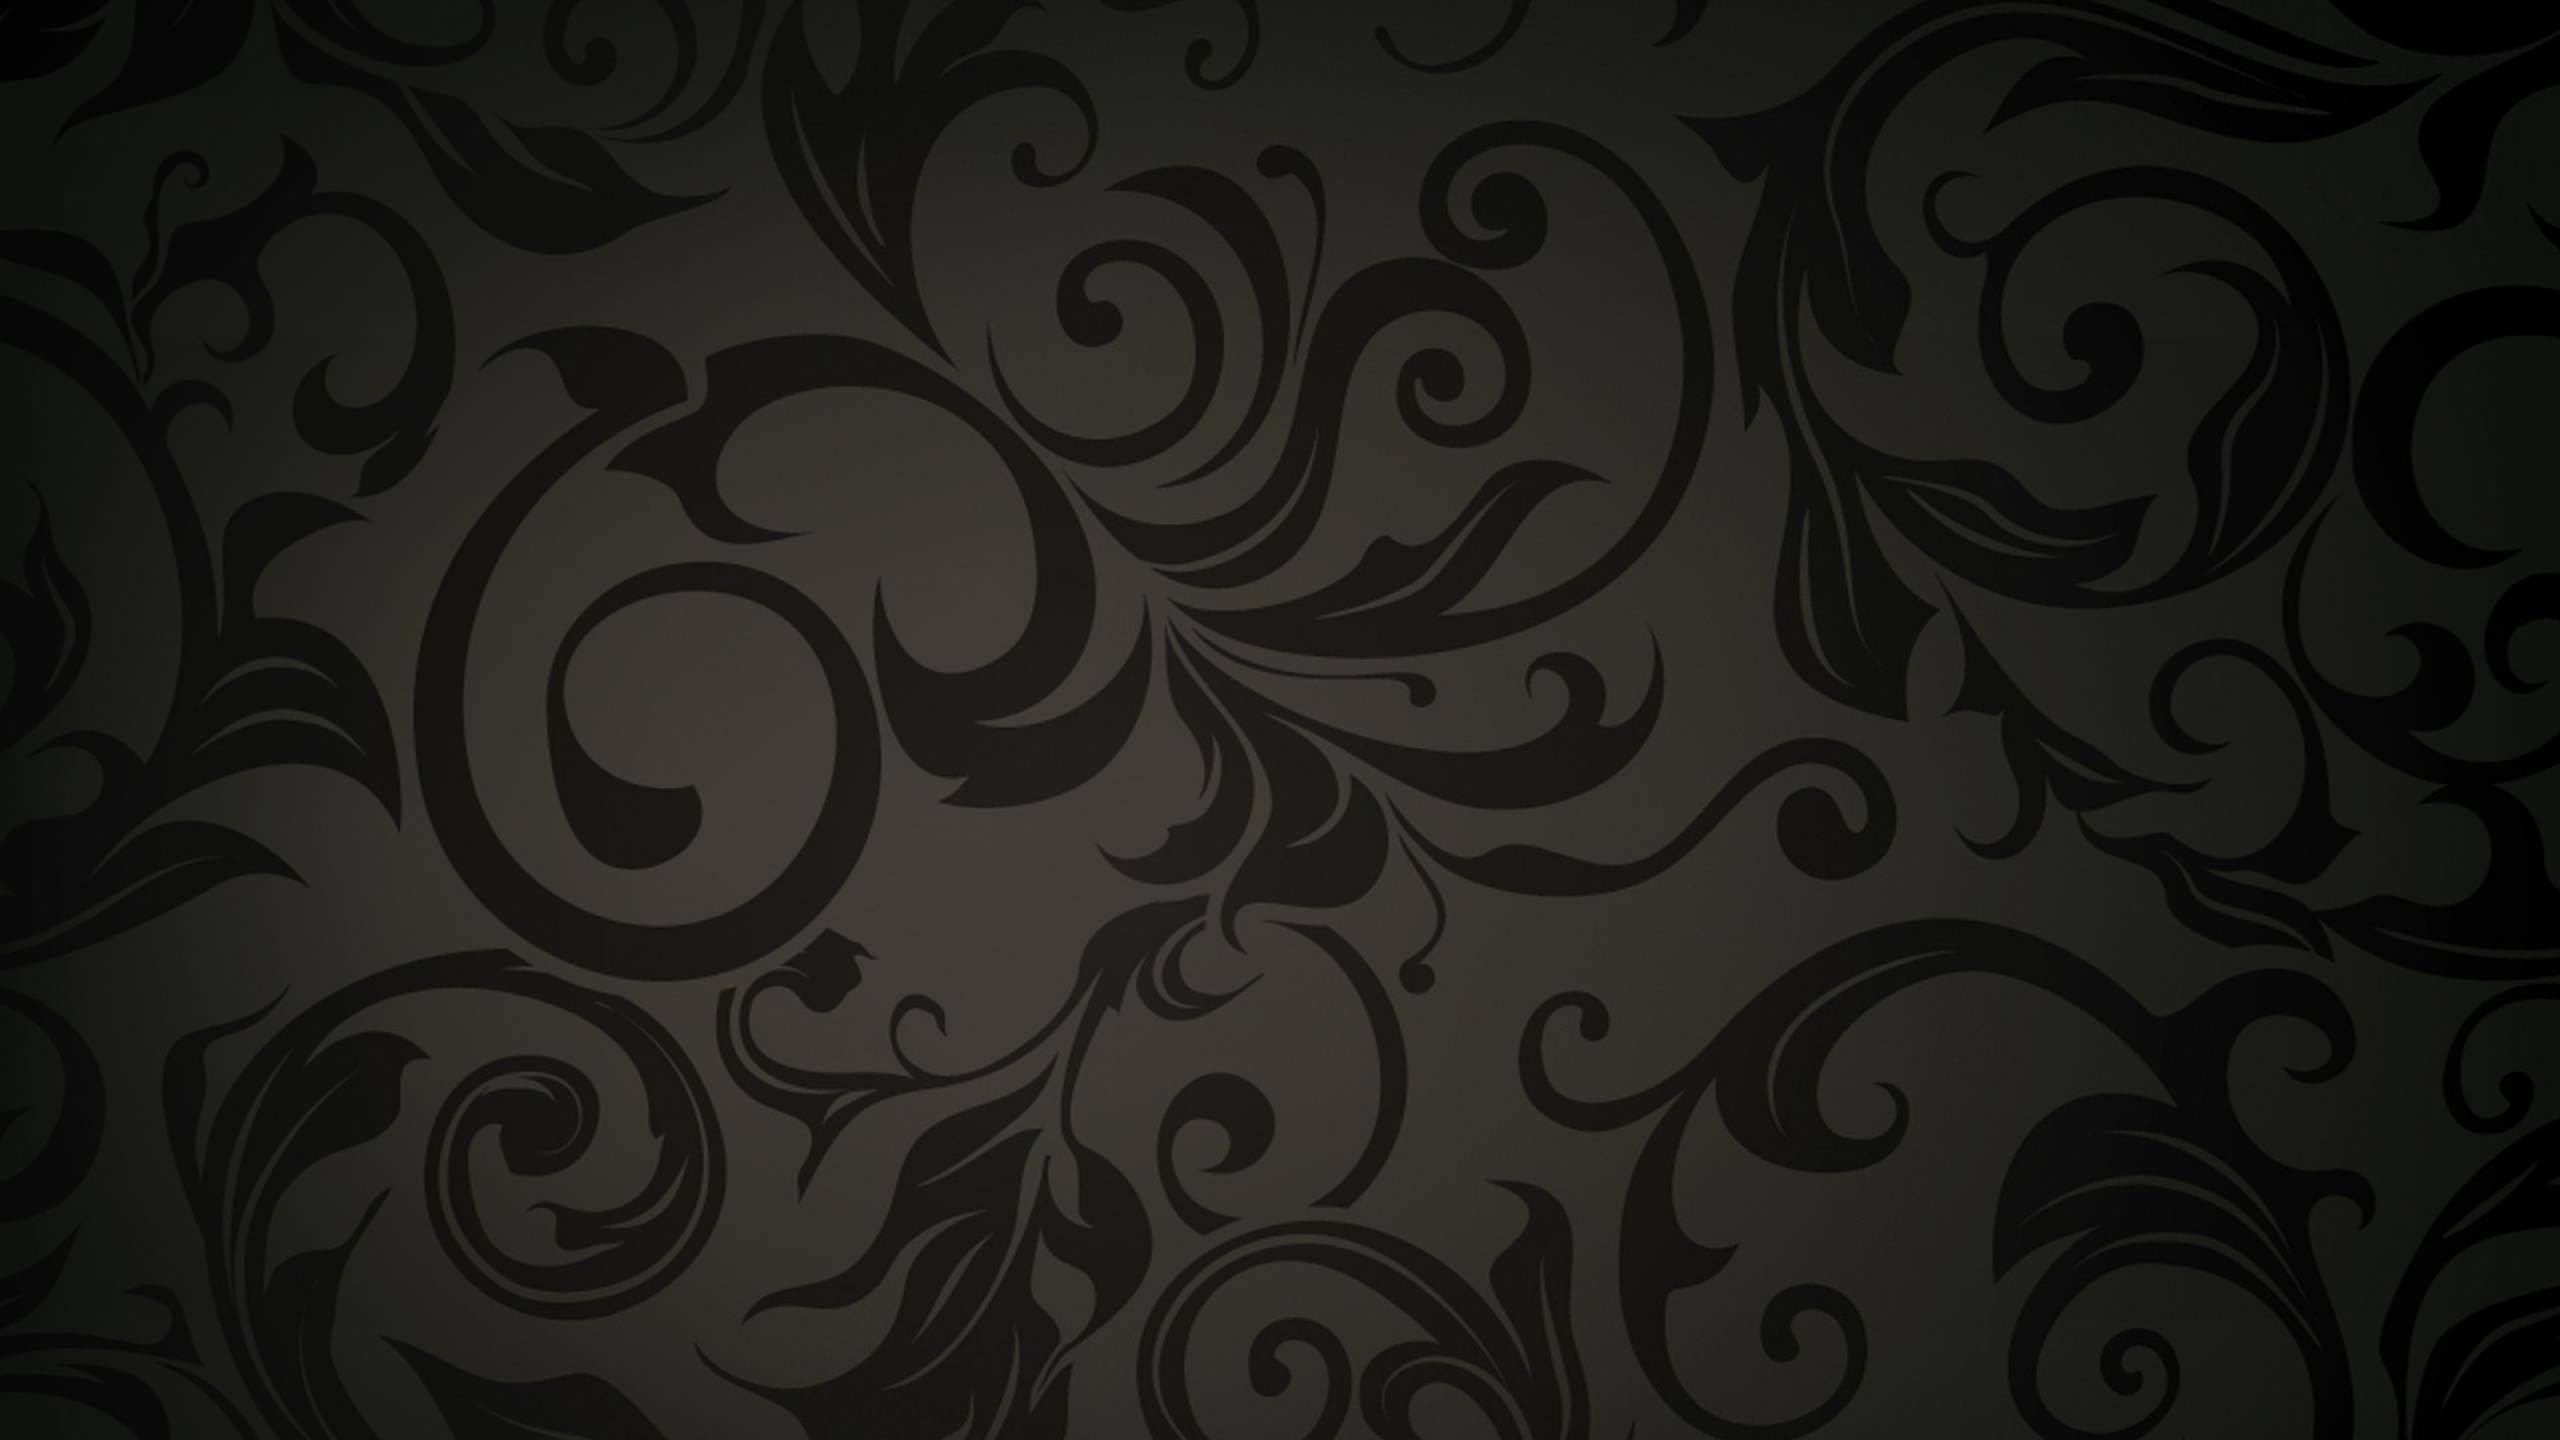 Pretty Dark Floral Pattern Wallpaper for Illustrator